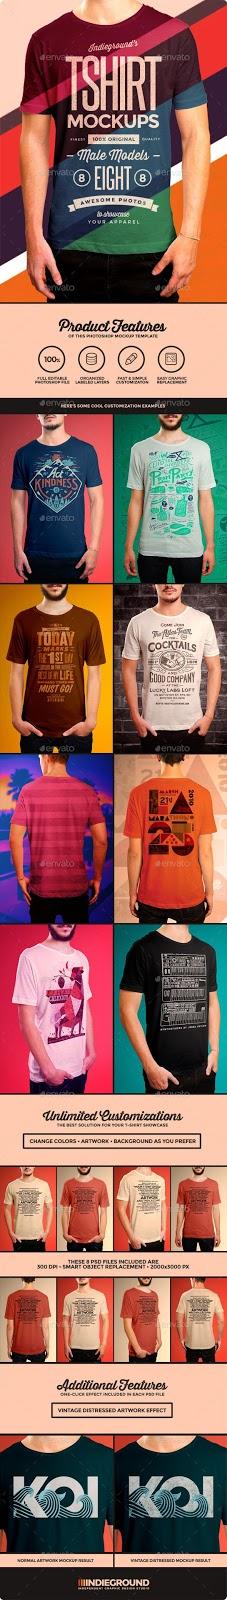 3. Menz T-Shirt Mockups